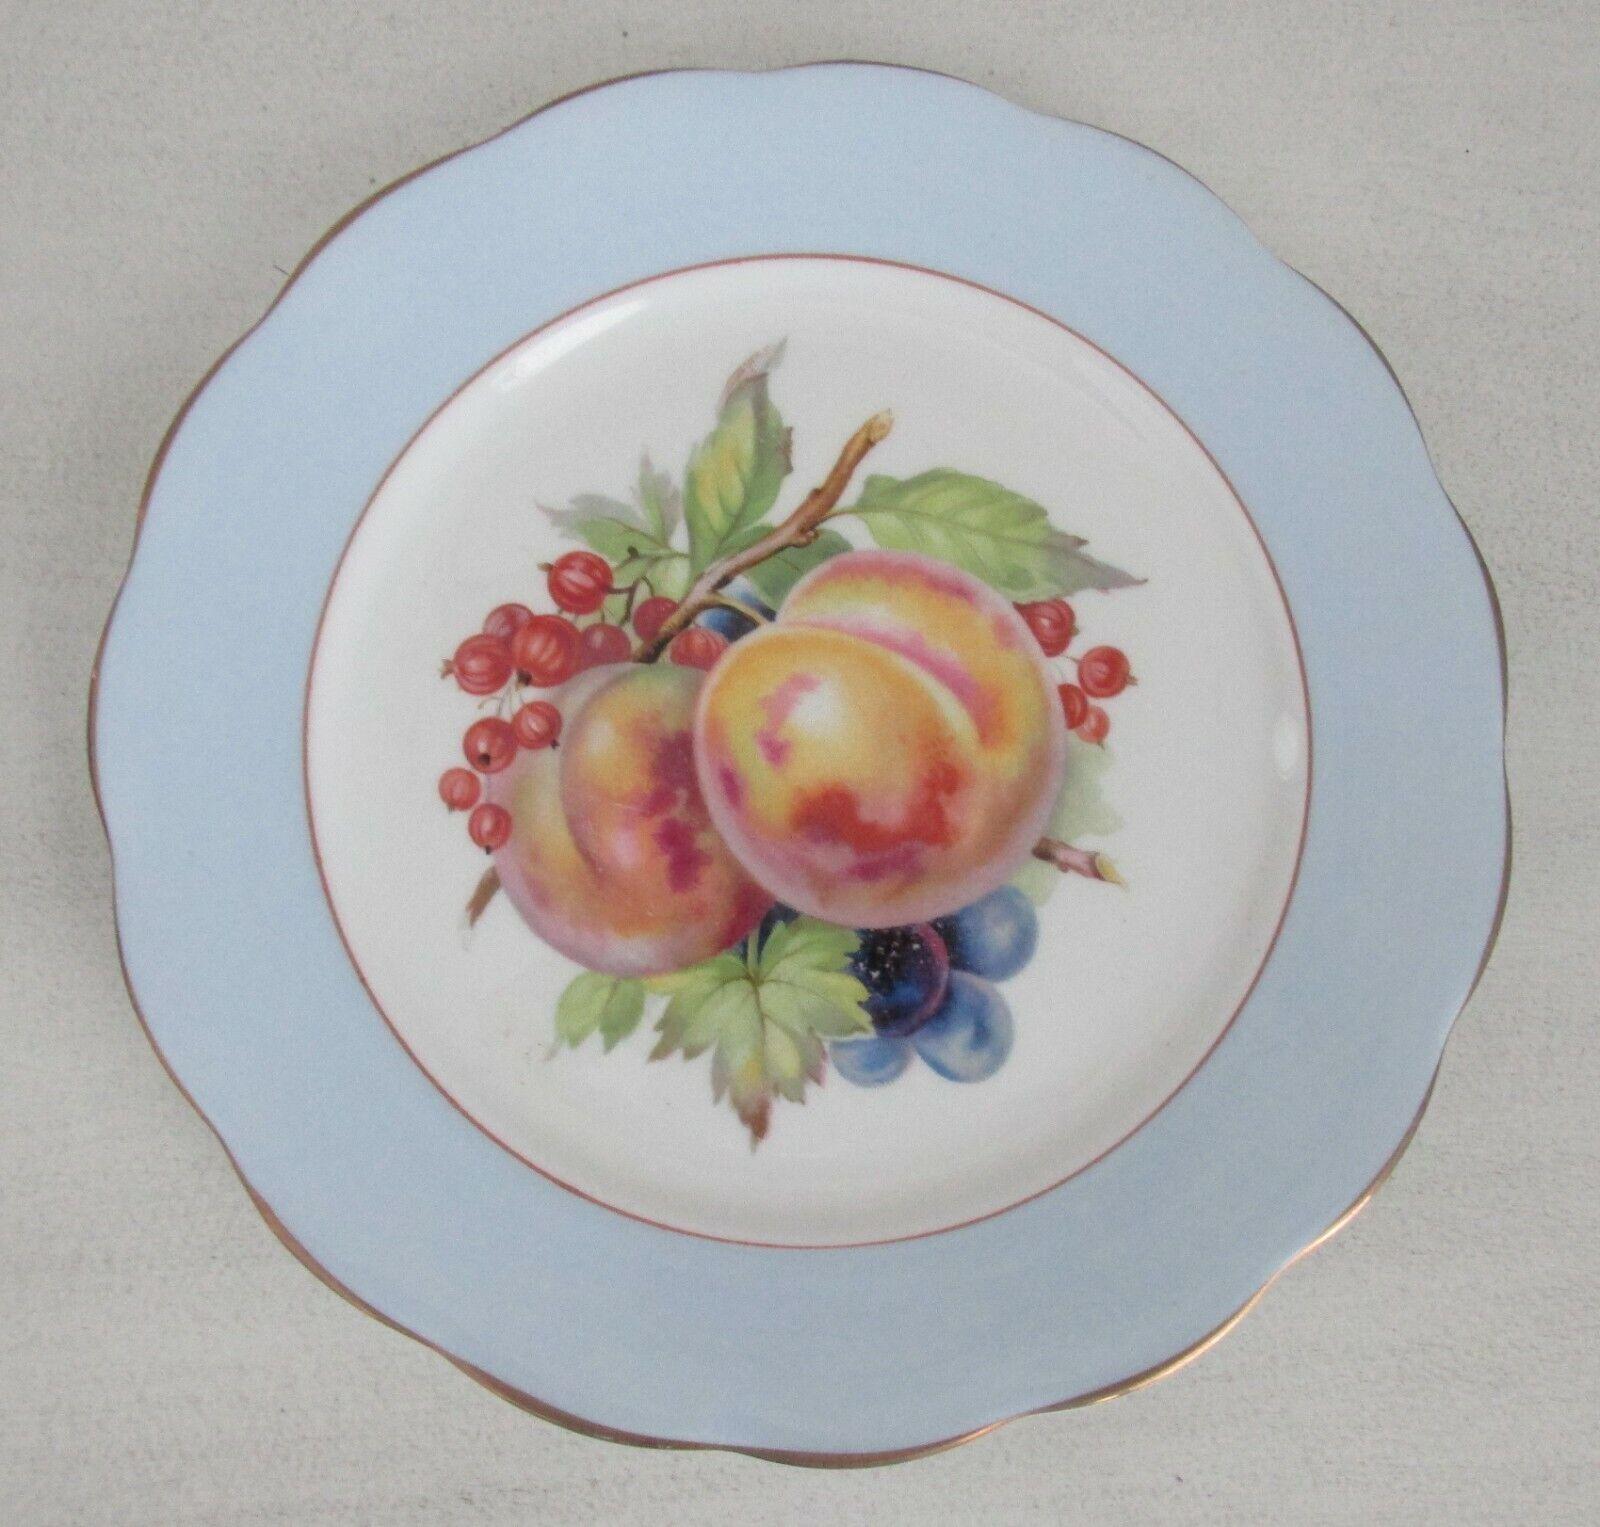 6 Copelands Grosvenor Bone China Pastel Blue Scalloped Dessert Plates With Fruit - $47.99